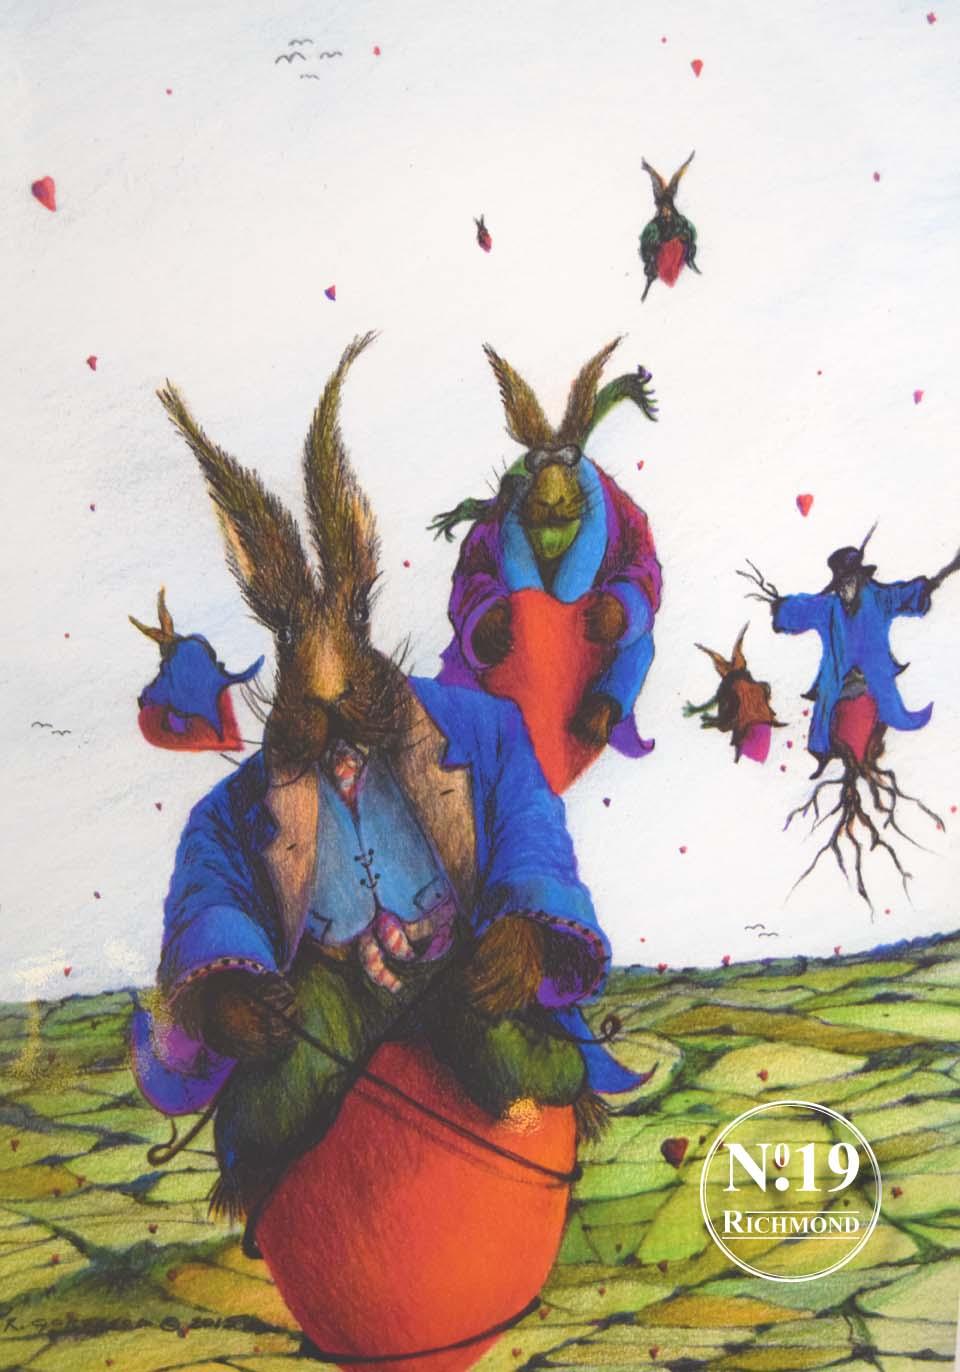 Giclee Print 'Pogo Hares' £40